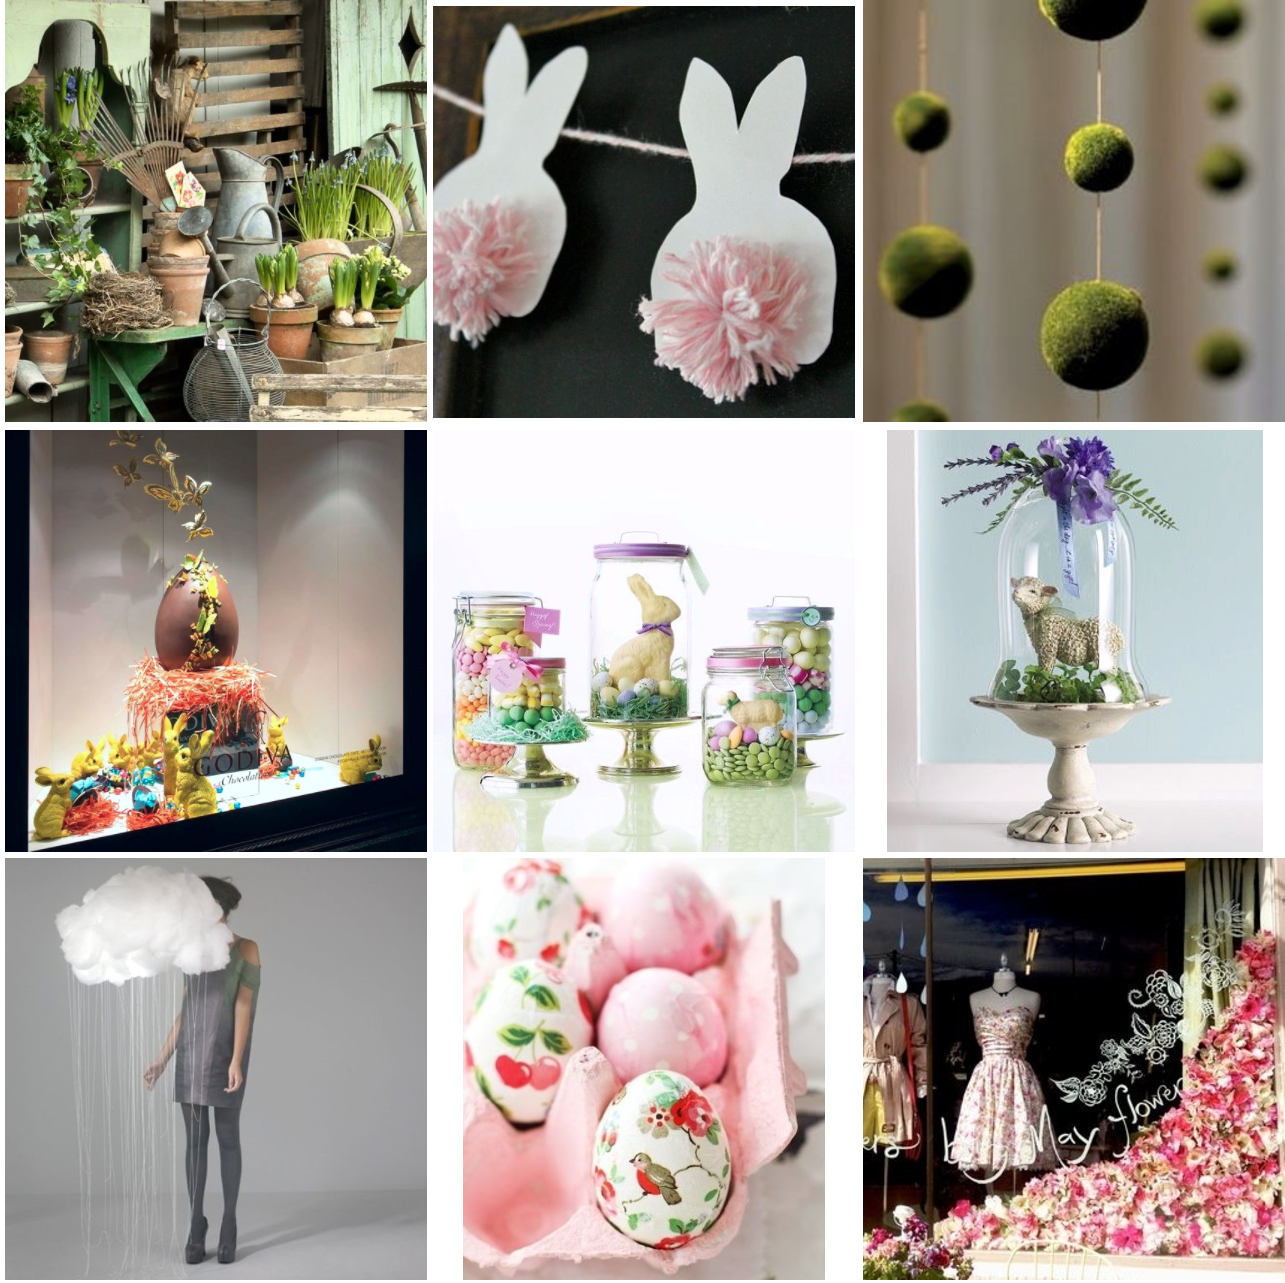 Inspiration images via Pinterest